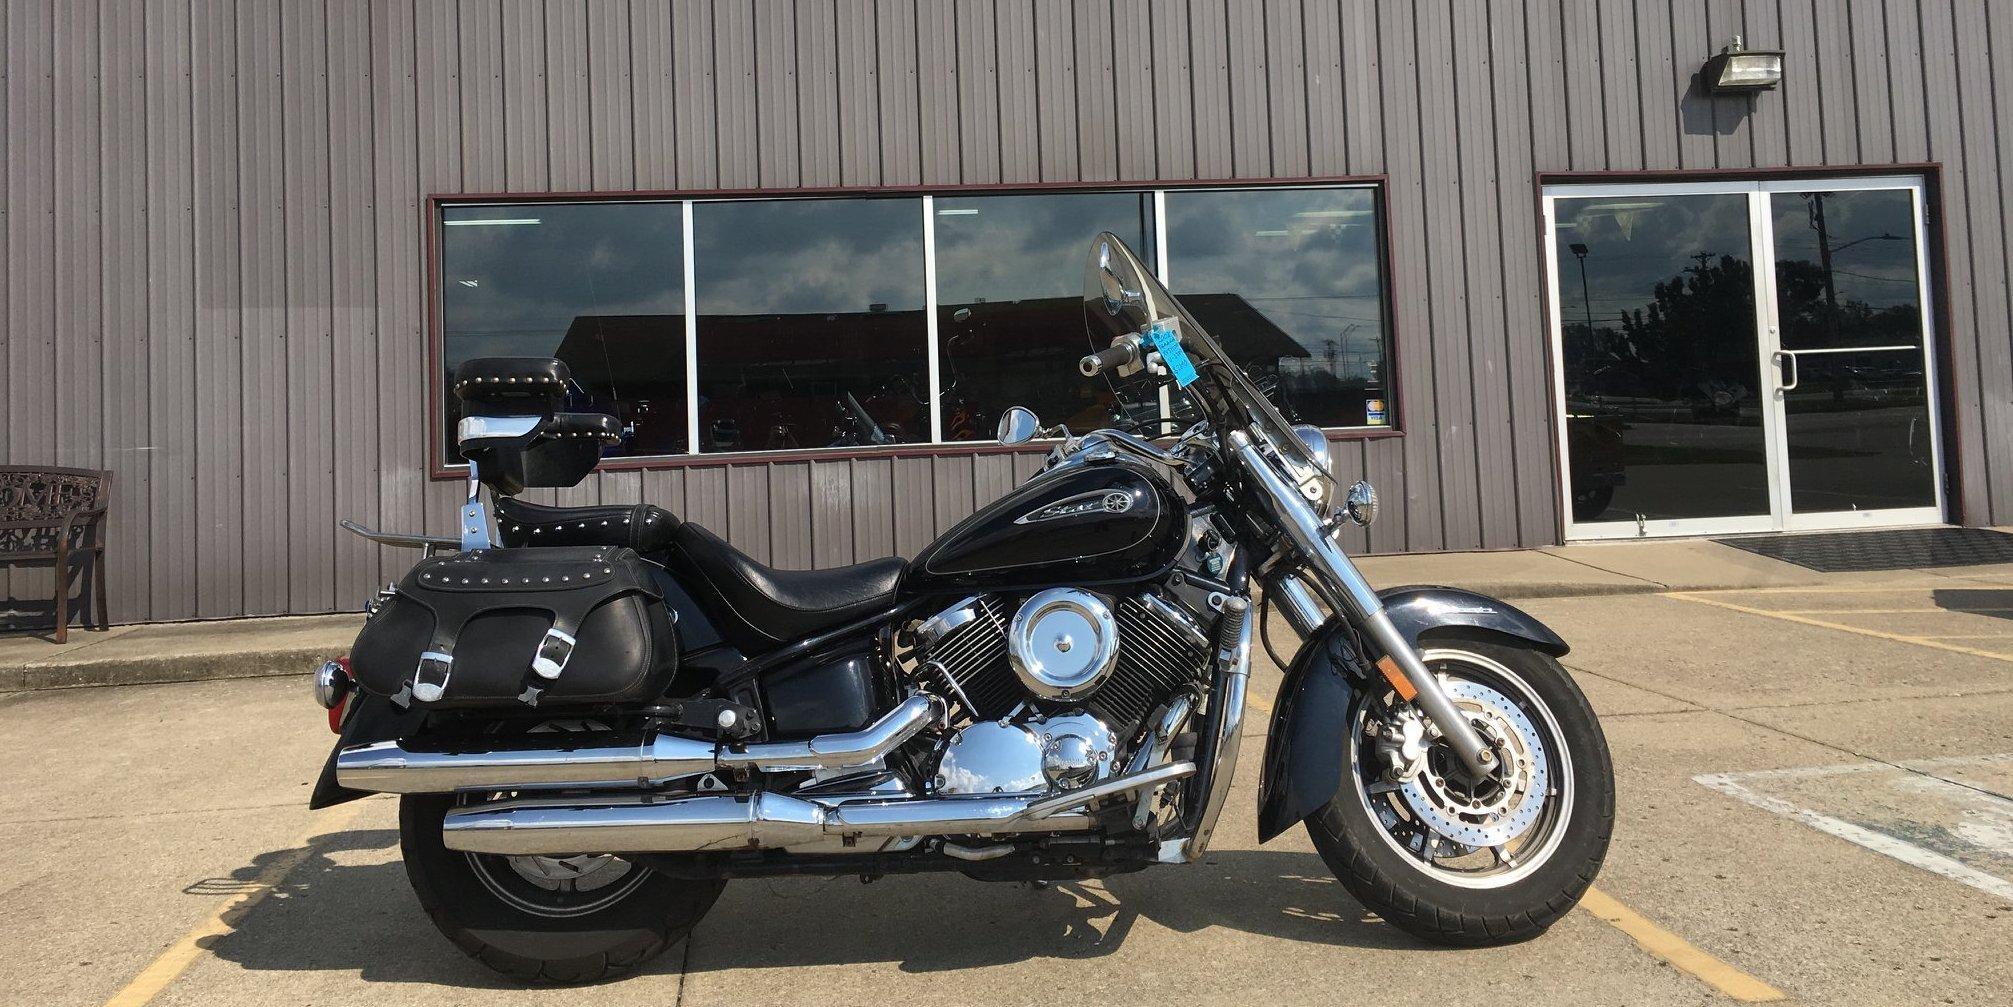 Yamaha XVS1100 V-Star Silverado 2008